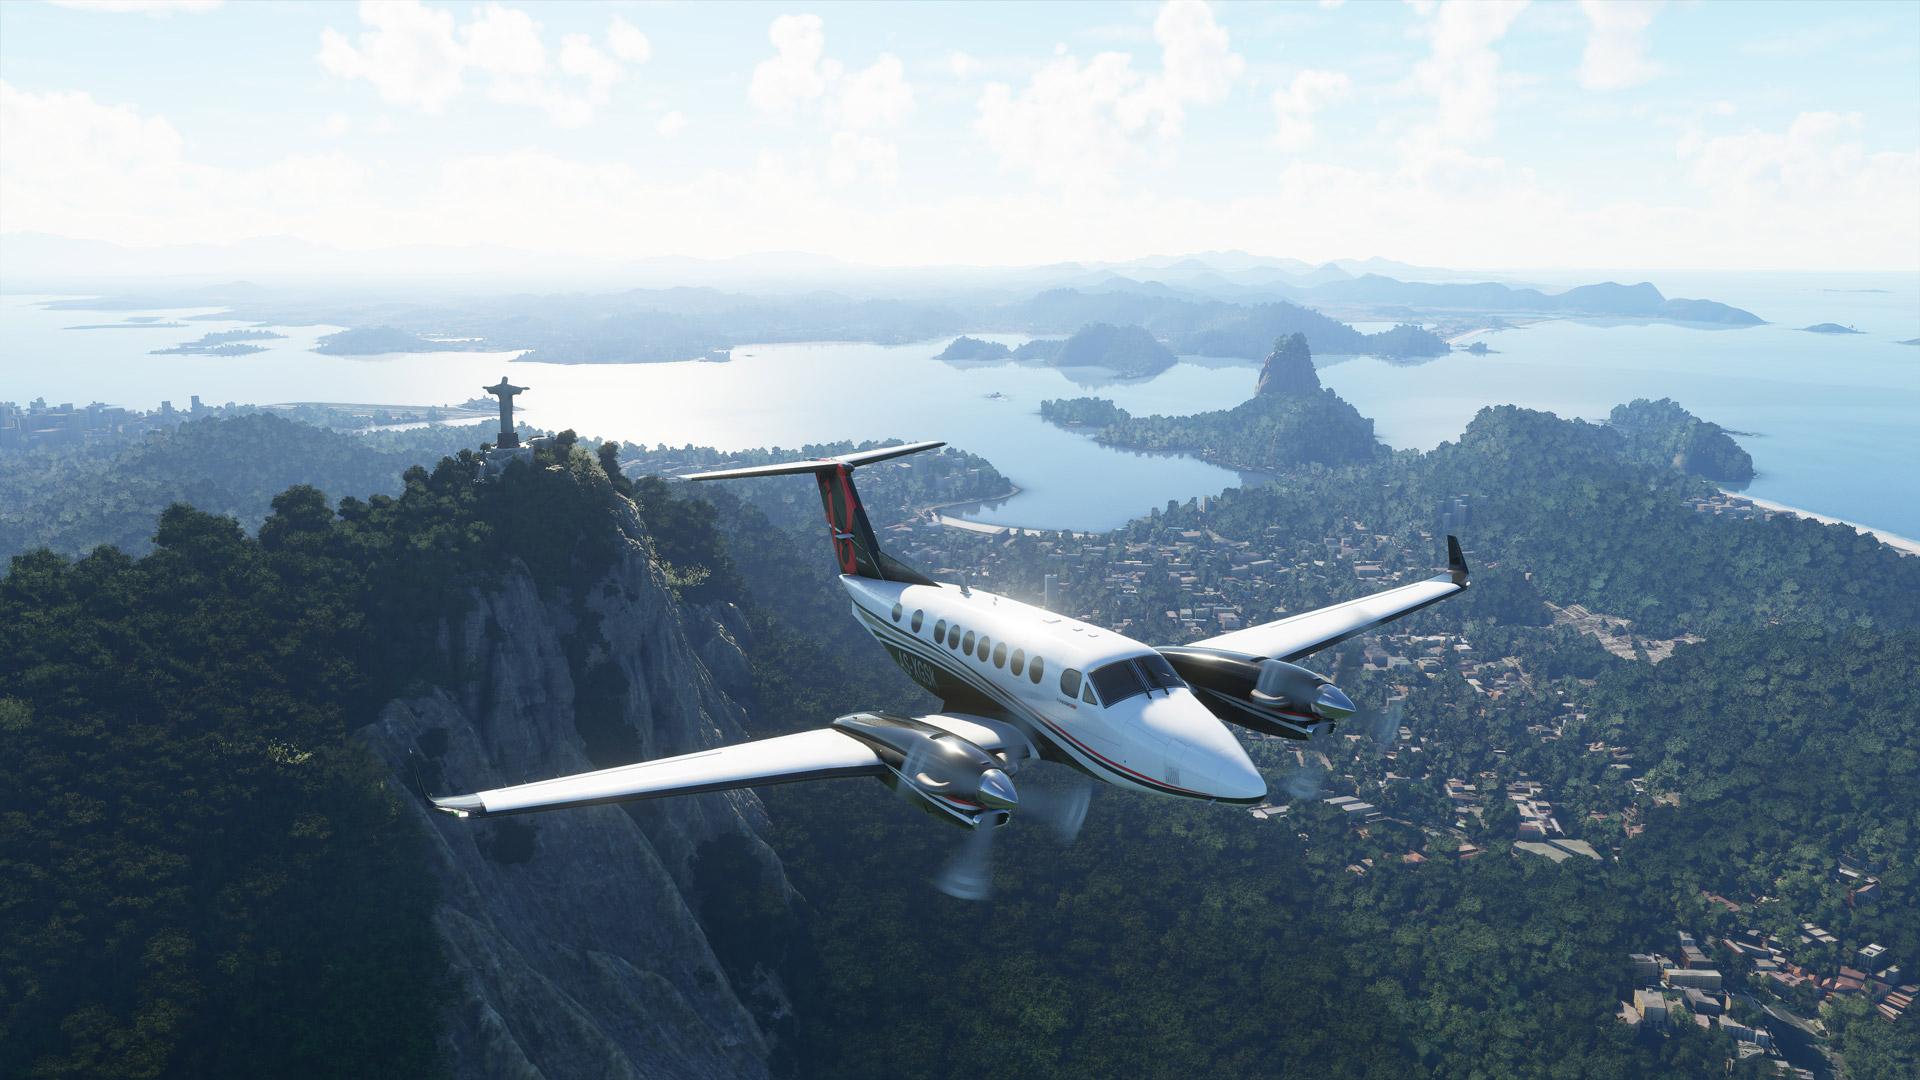 Free Microsoft Flight Simulator (2020) Wallpaper in 1920x1080